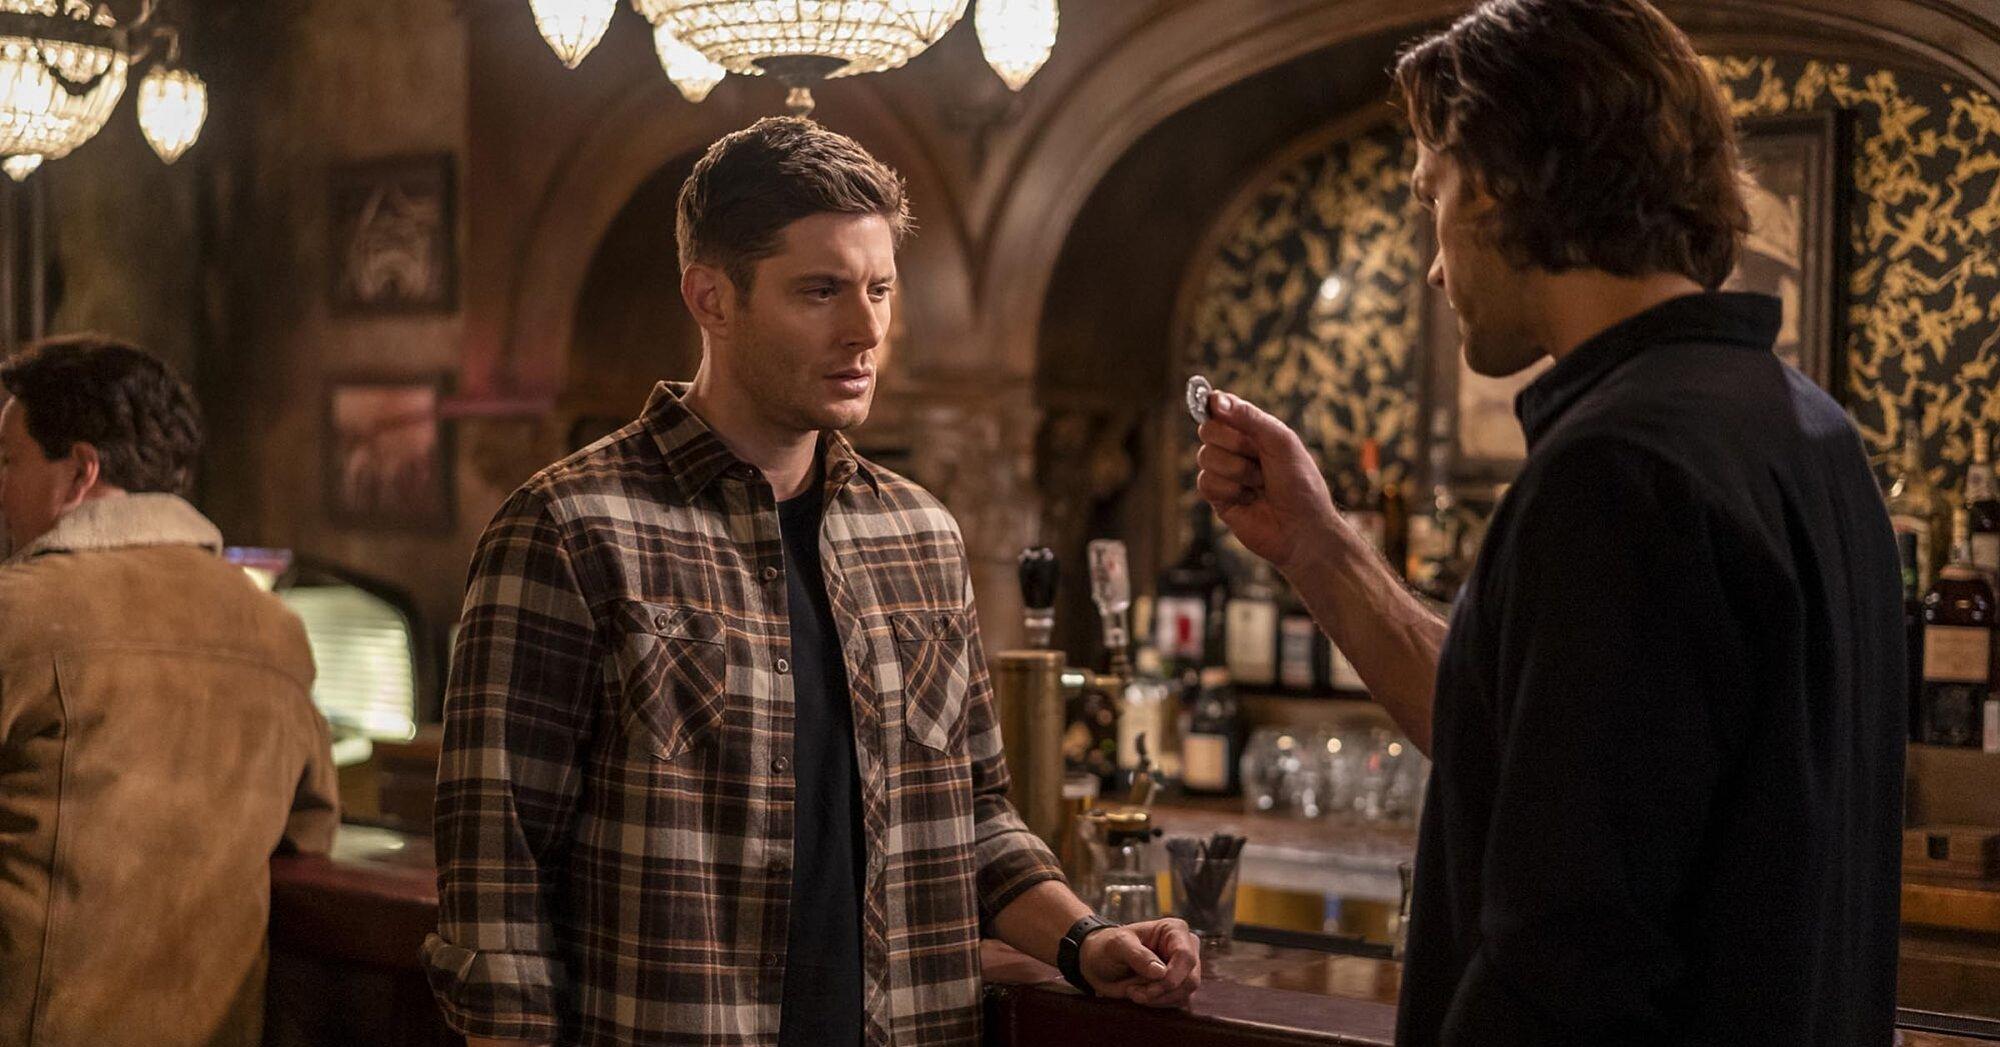 supernatural season 11 episode 20